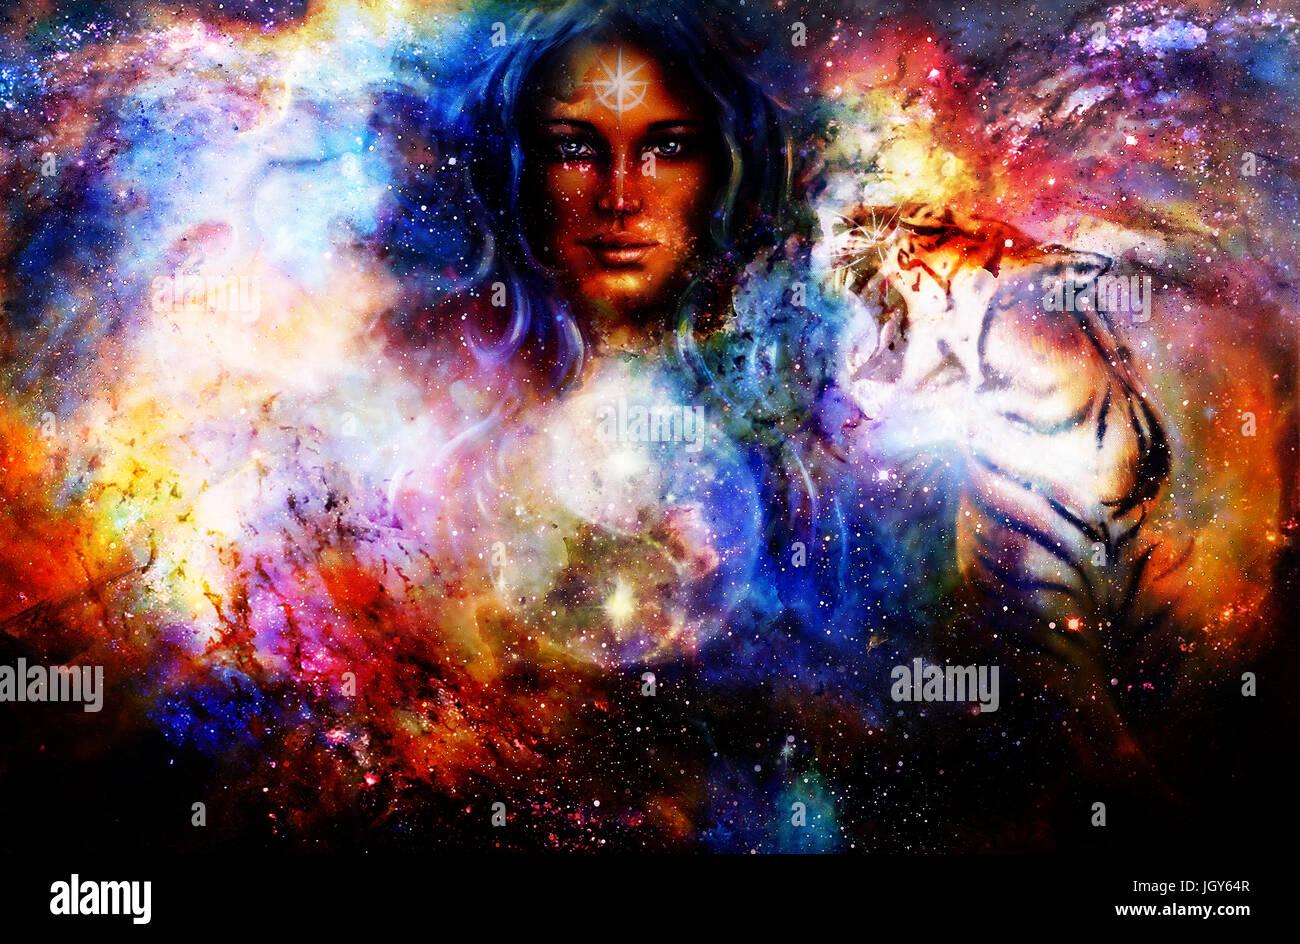 Woman as goddess